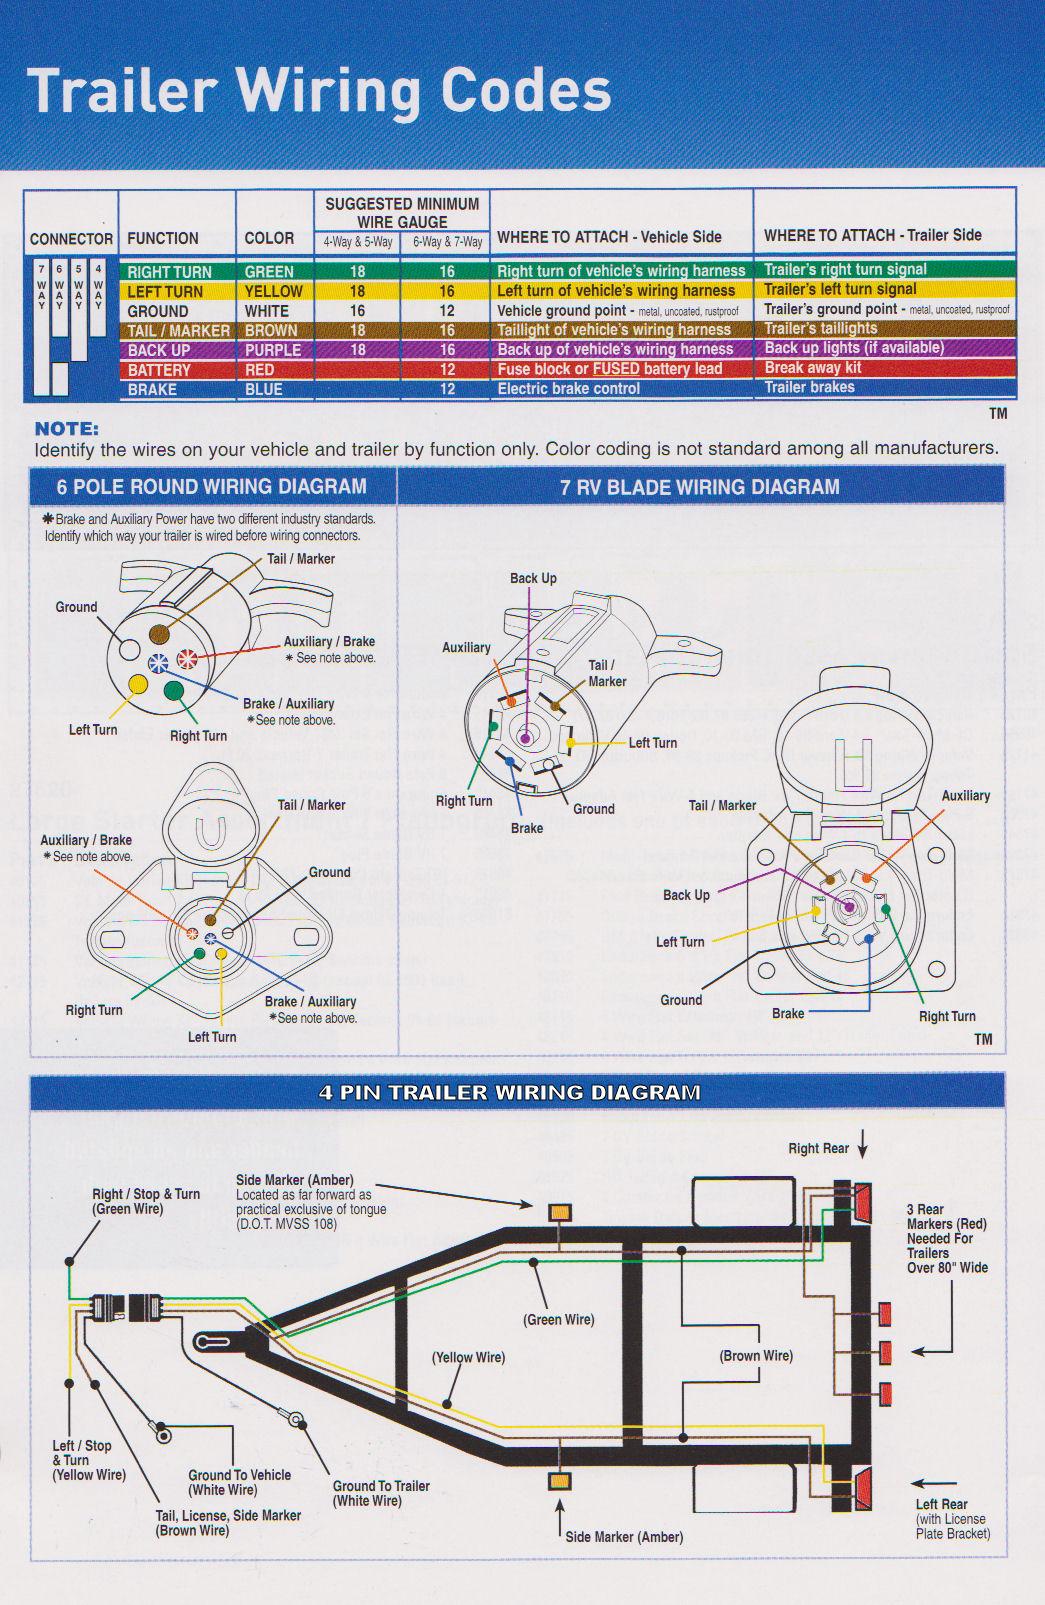 Wells Cargo Trailer Ke Wiring Diagram. . Wiring Diagram on